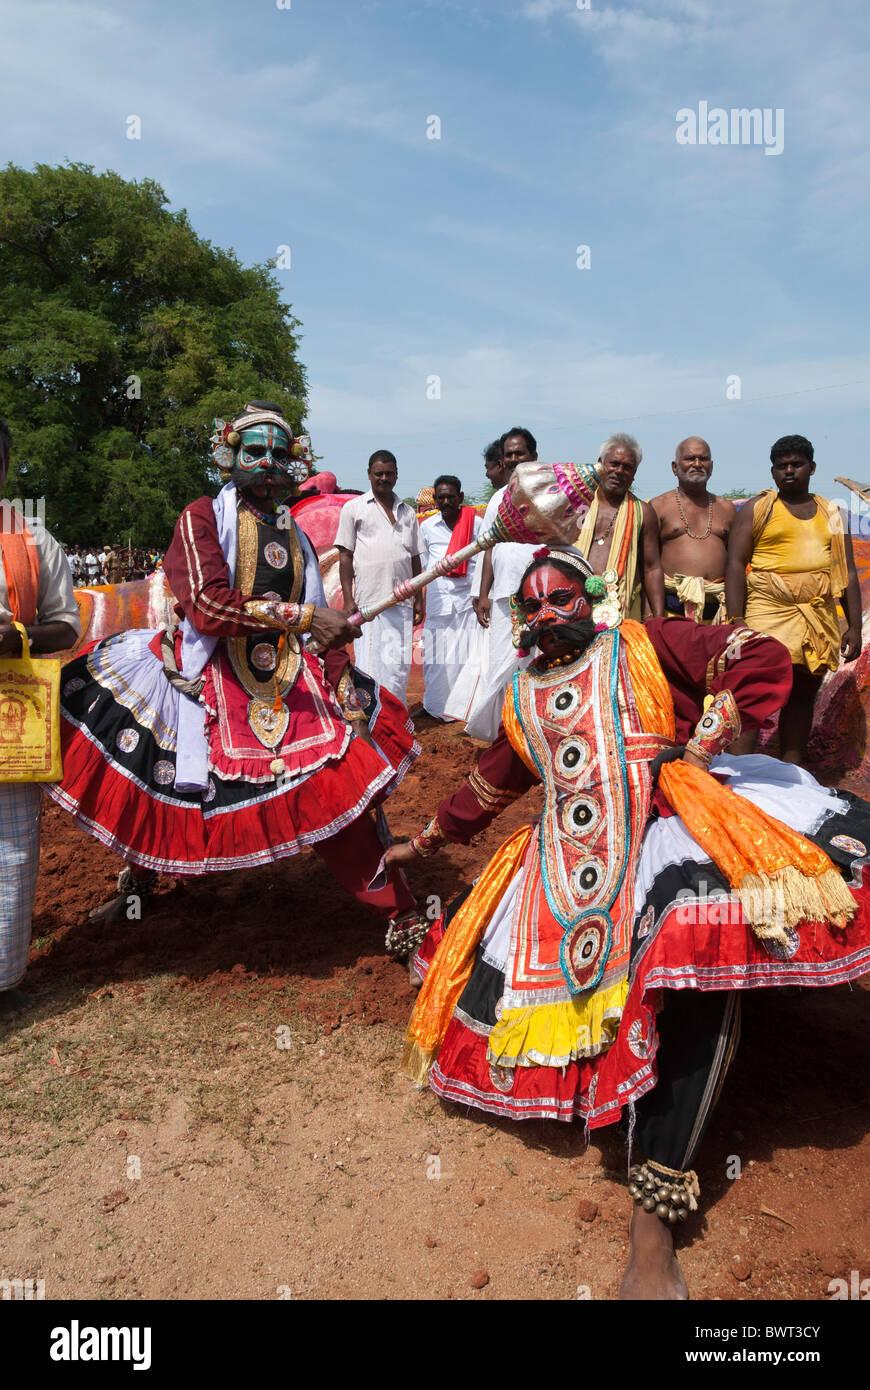 Bhima and Duryodhana on way to the battlefield. Patukalam festival at Sevelimedu in Kanchipuram, Tamil Nadu, South - Stock Image